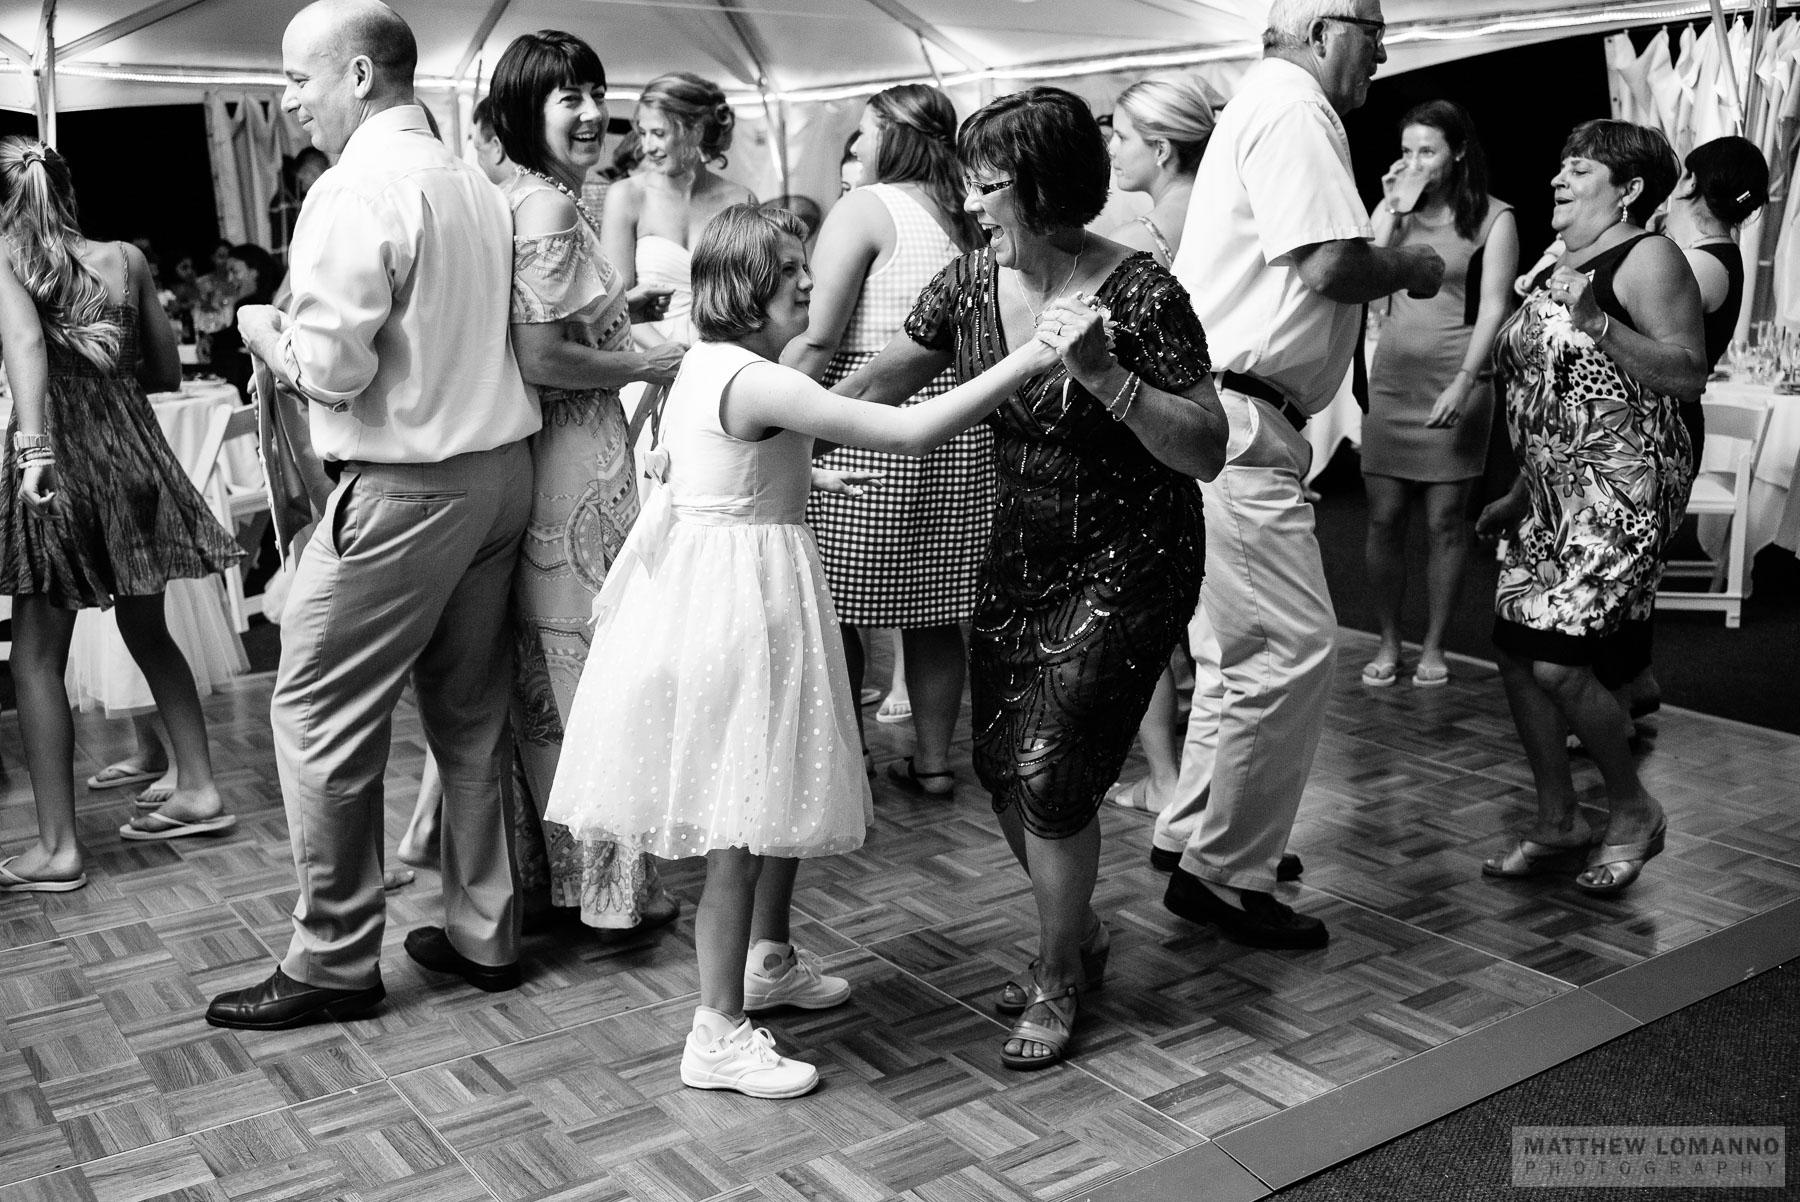 Madeline&Gerin_reception_by_Lomanno_0096_web.jpg